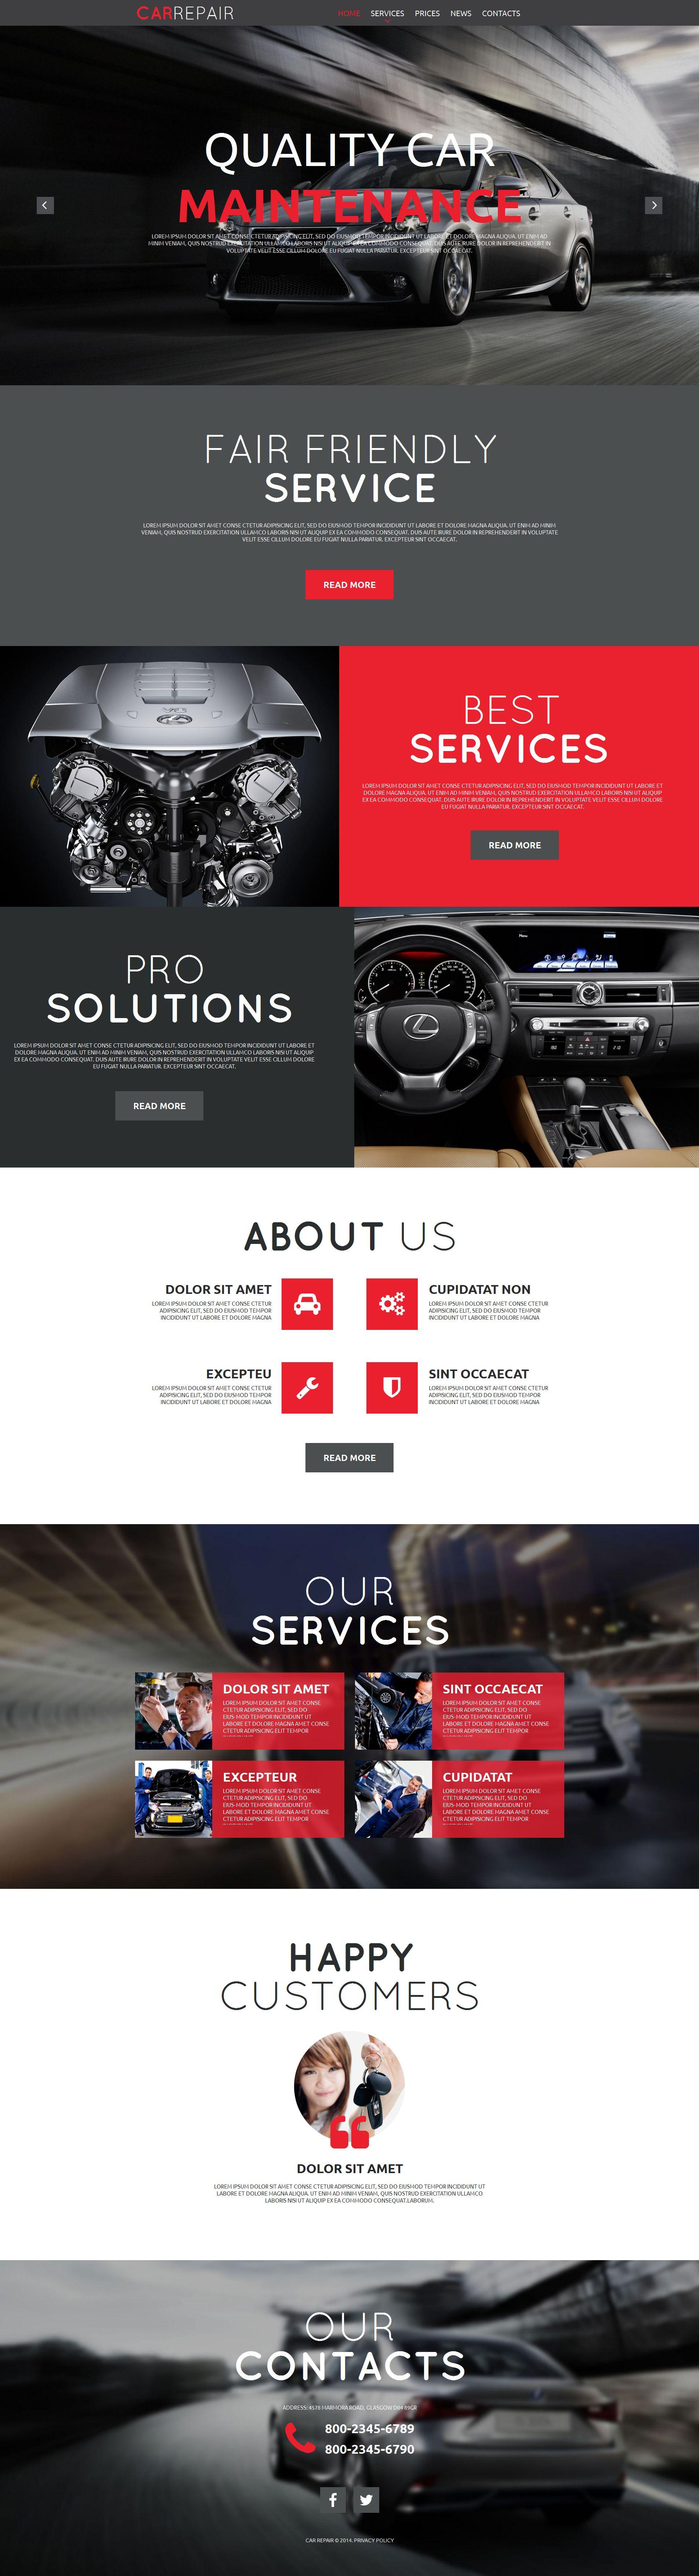 Car Repair Moto CMS HTML Template